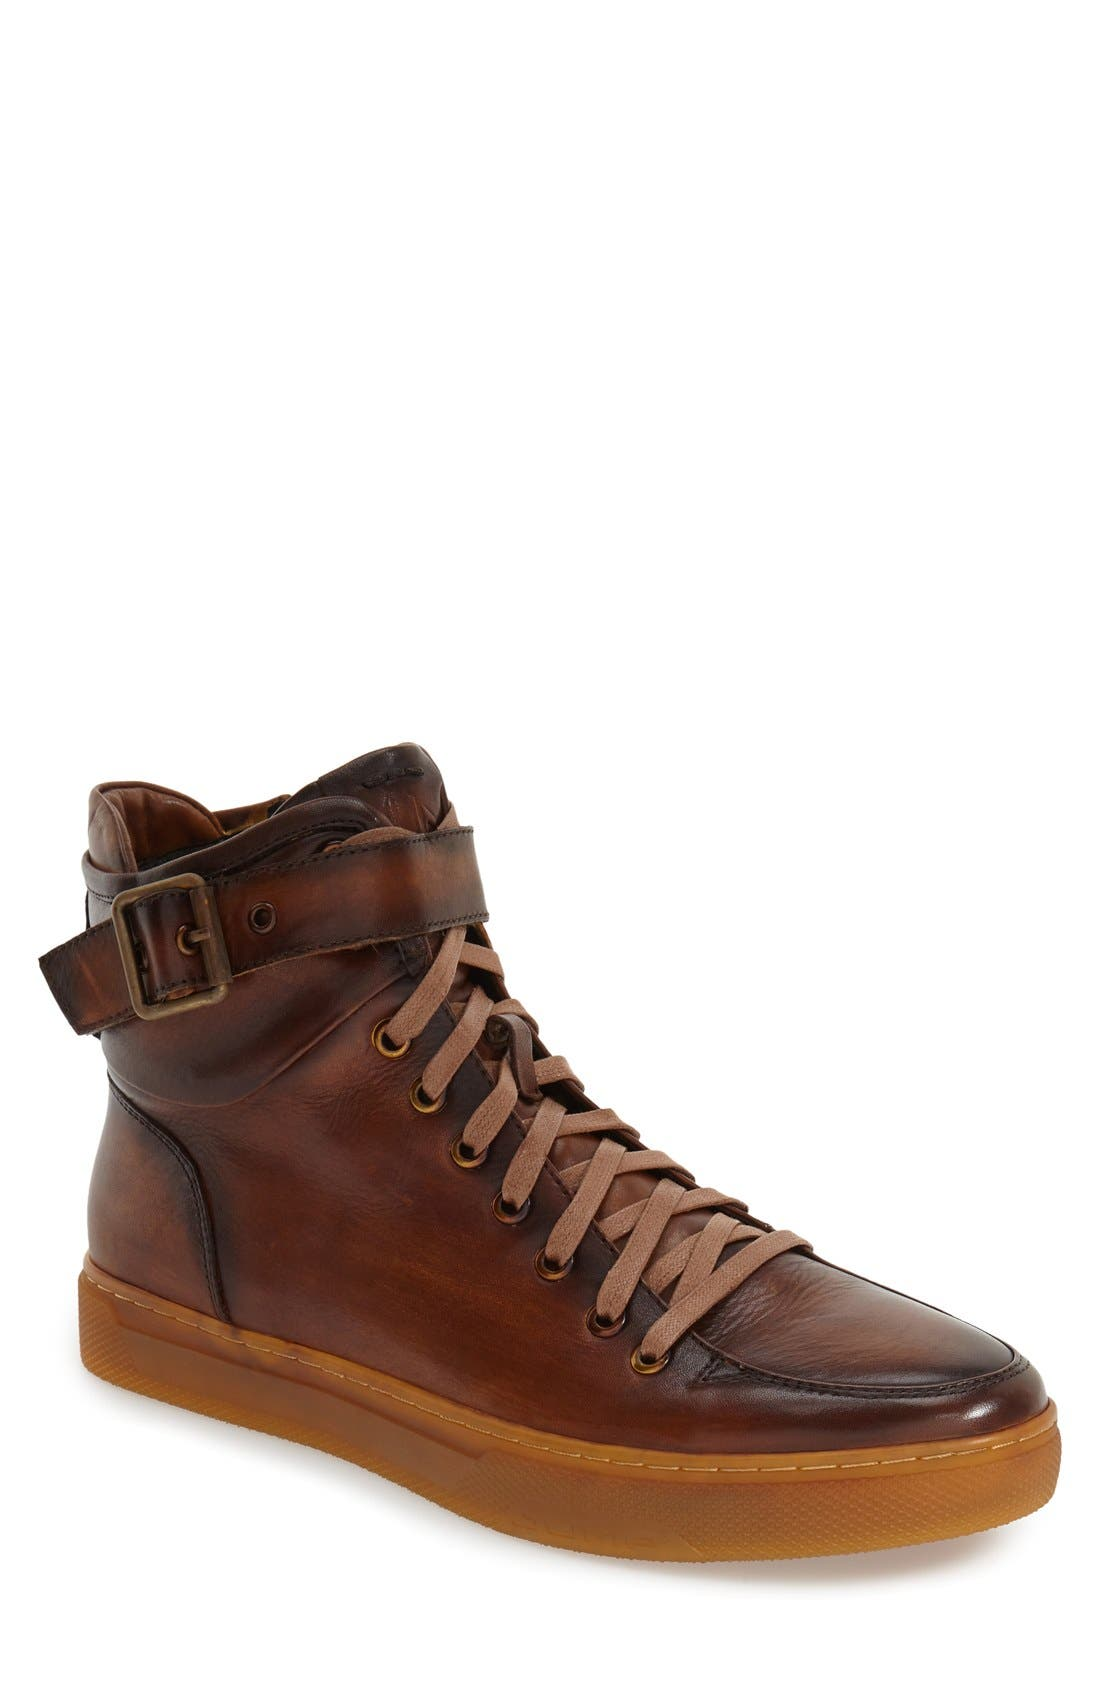 Sullivan High Top Sneaker,                         Main,                         color, TAN LEATHER